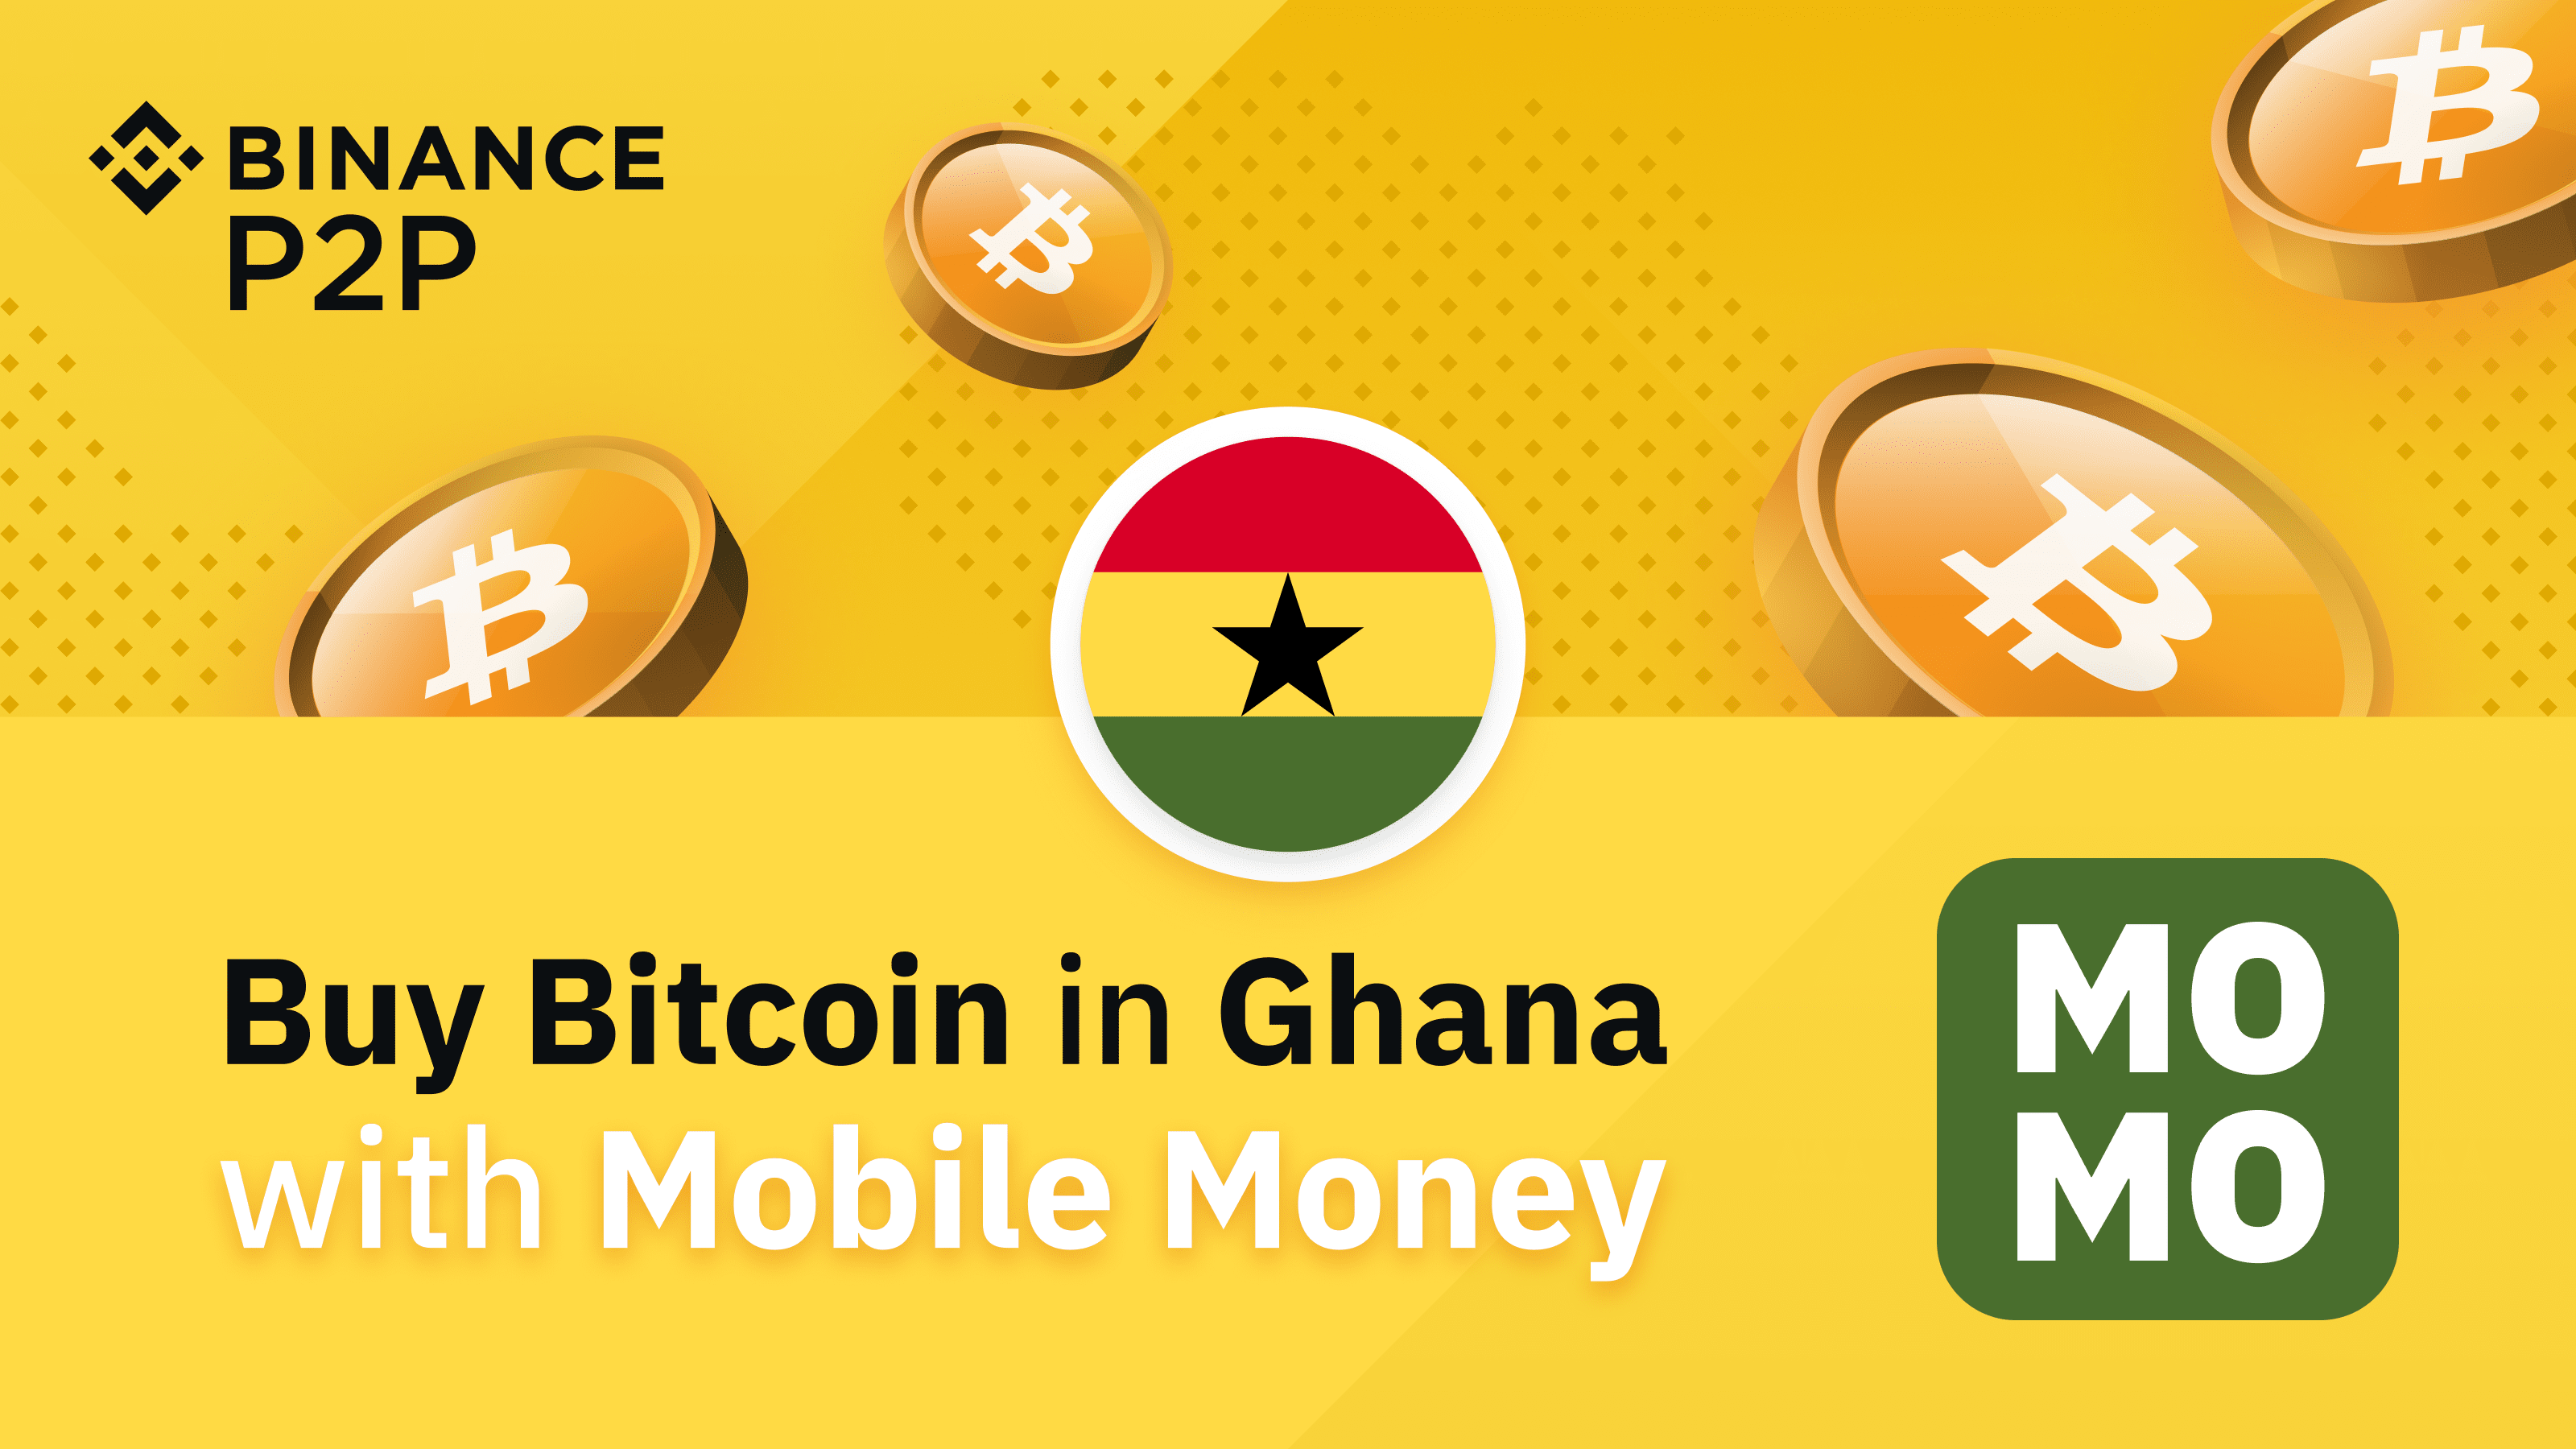 Binance P2P: Buy Bitcoin in Ghana with Mobile Money ...